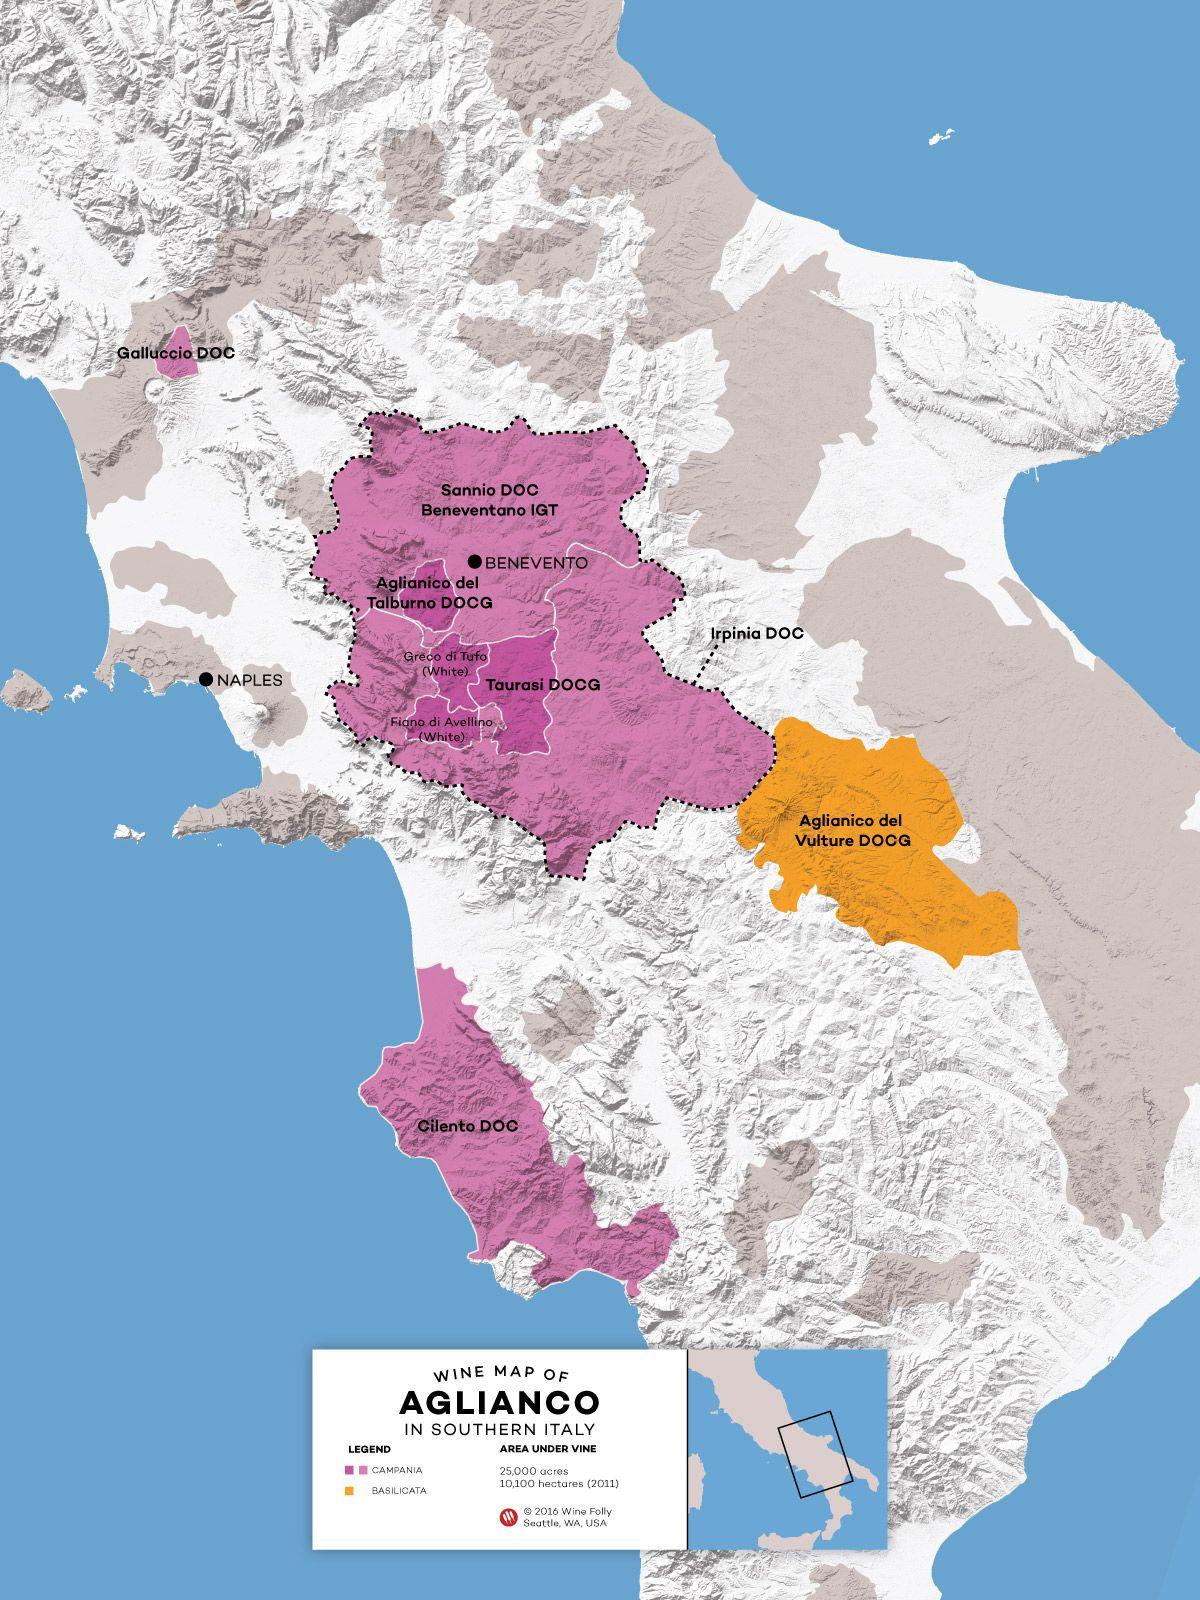 Southern Italy Aglianico Regions Within Basilicata And Campania By